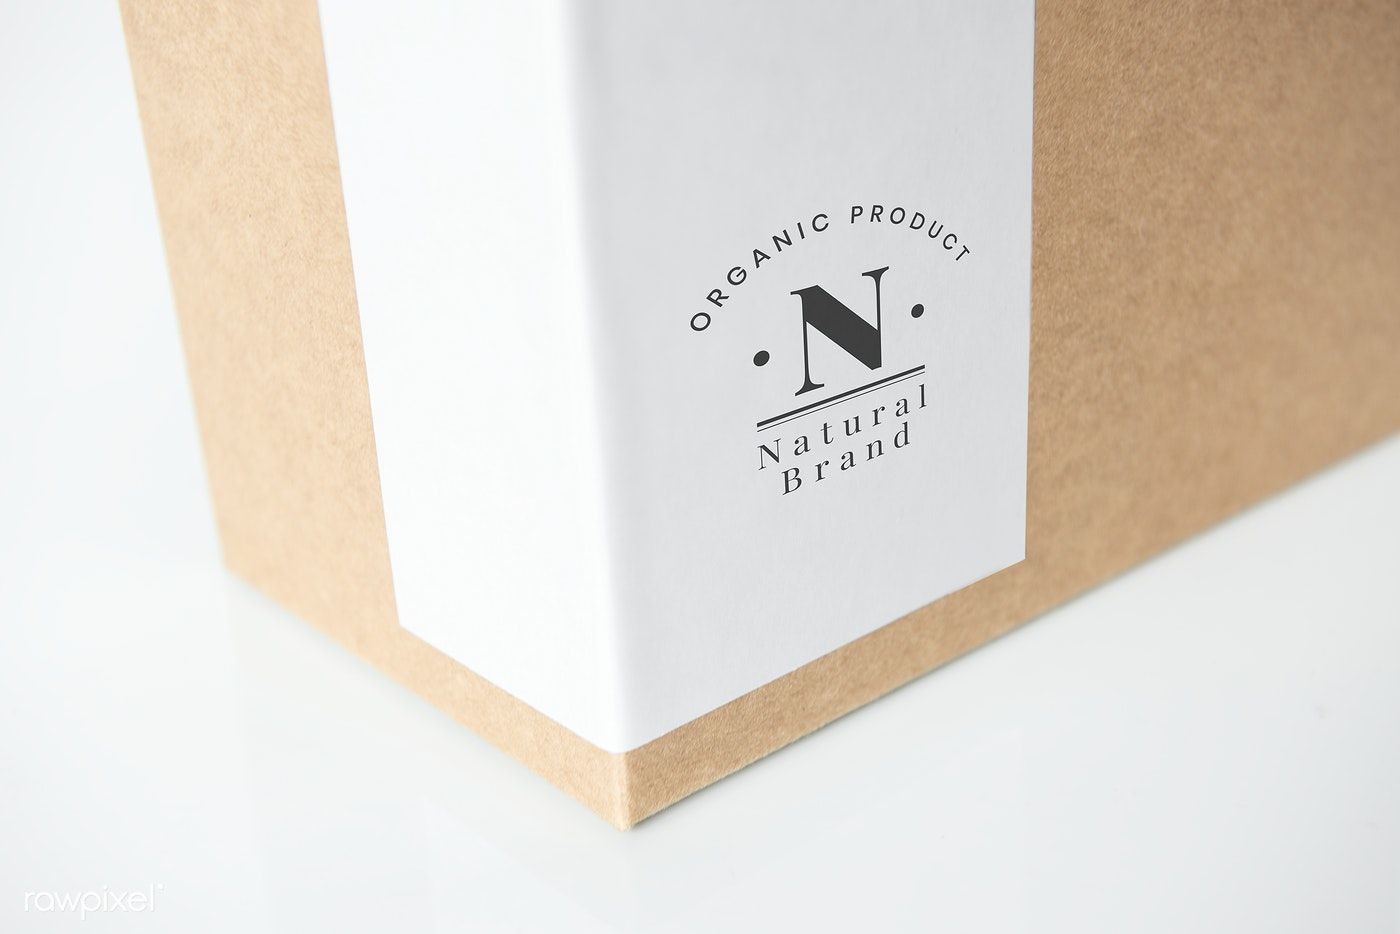 Download Natural Paper Box Packaging Mockup Free Image By Rawpixel Com Packaging Mockup Mockup Packaging Box Paper Box